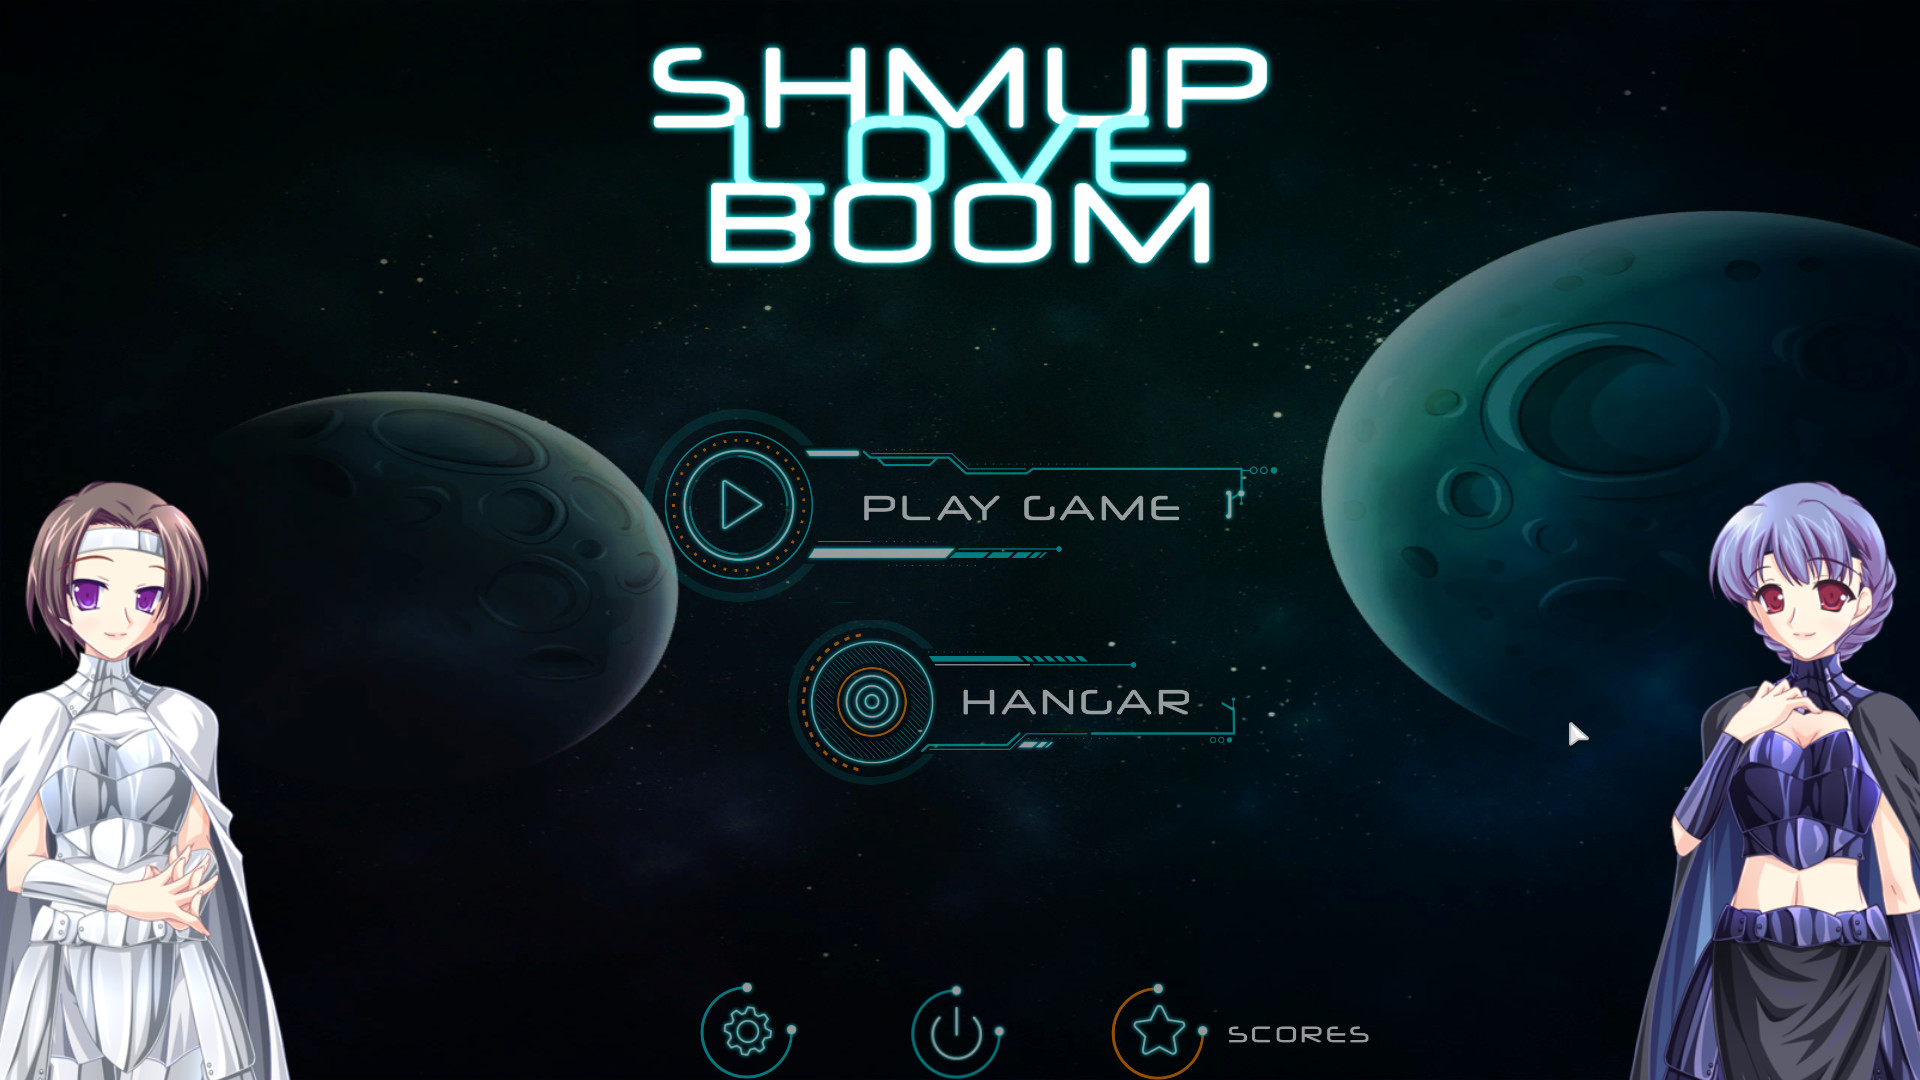 Shmup Love Boom - Soundtrack screenshot